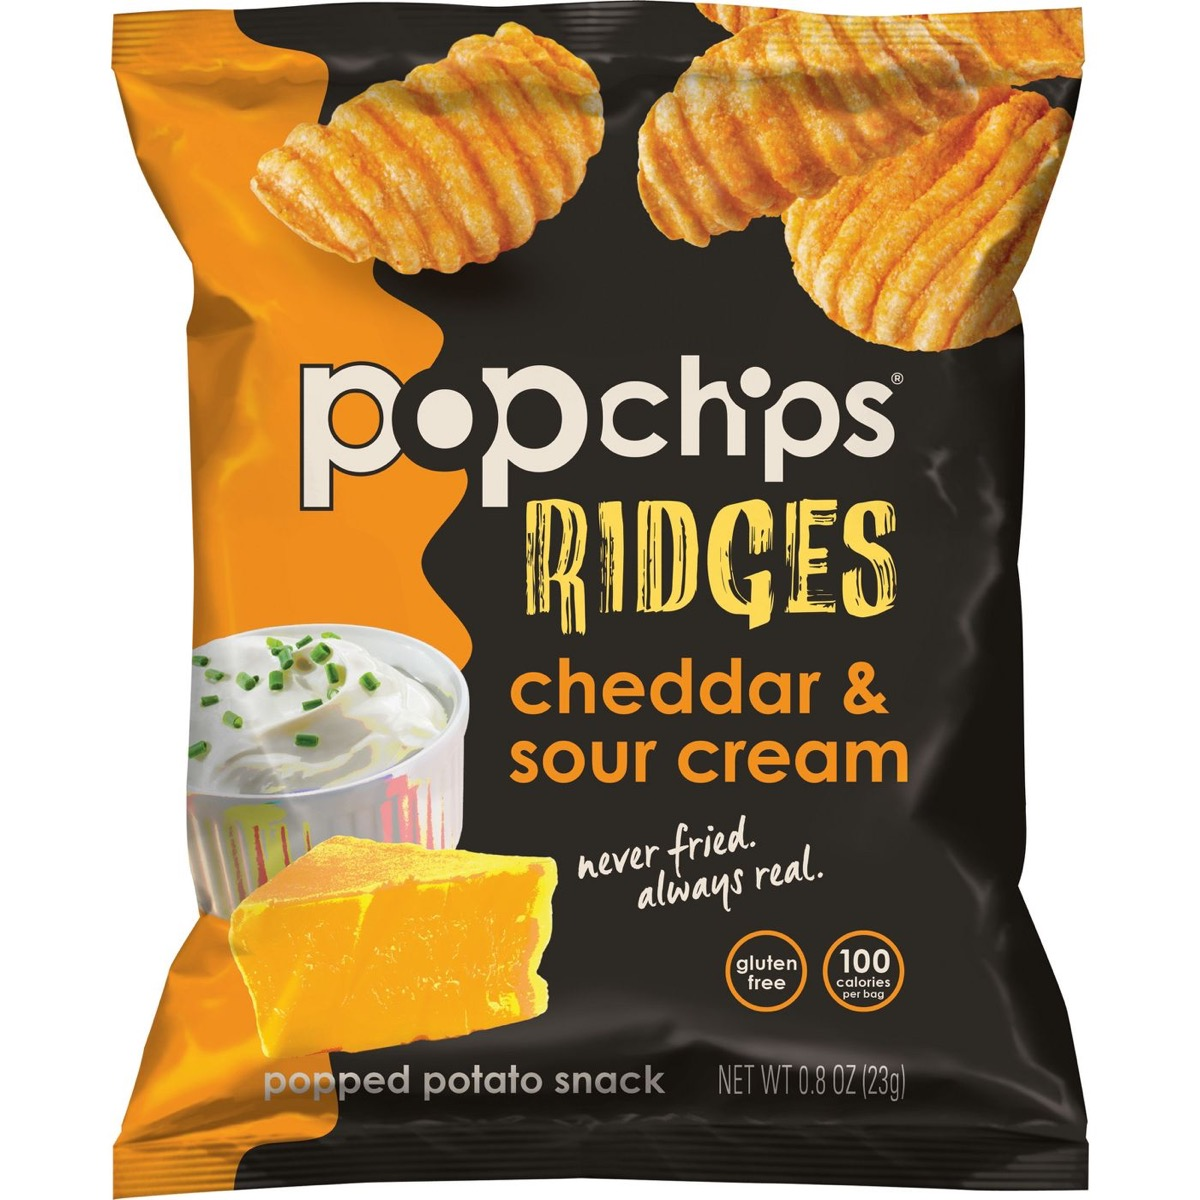 popchips ridges cheddar and sour cream, gluten-free snacks